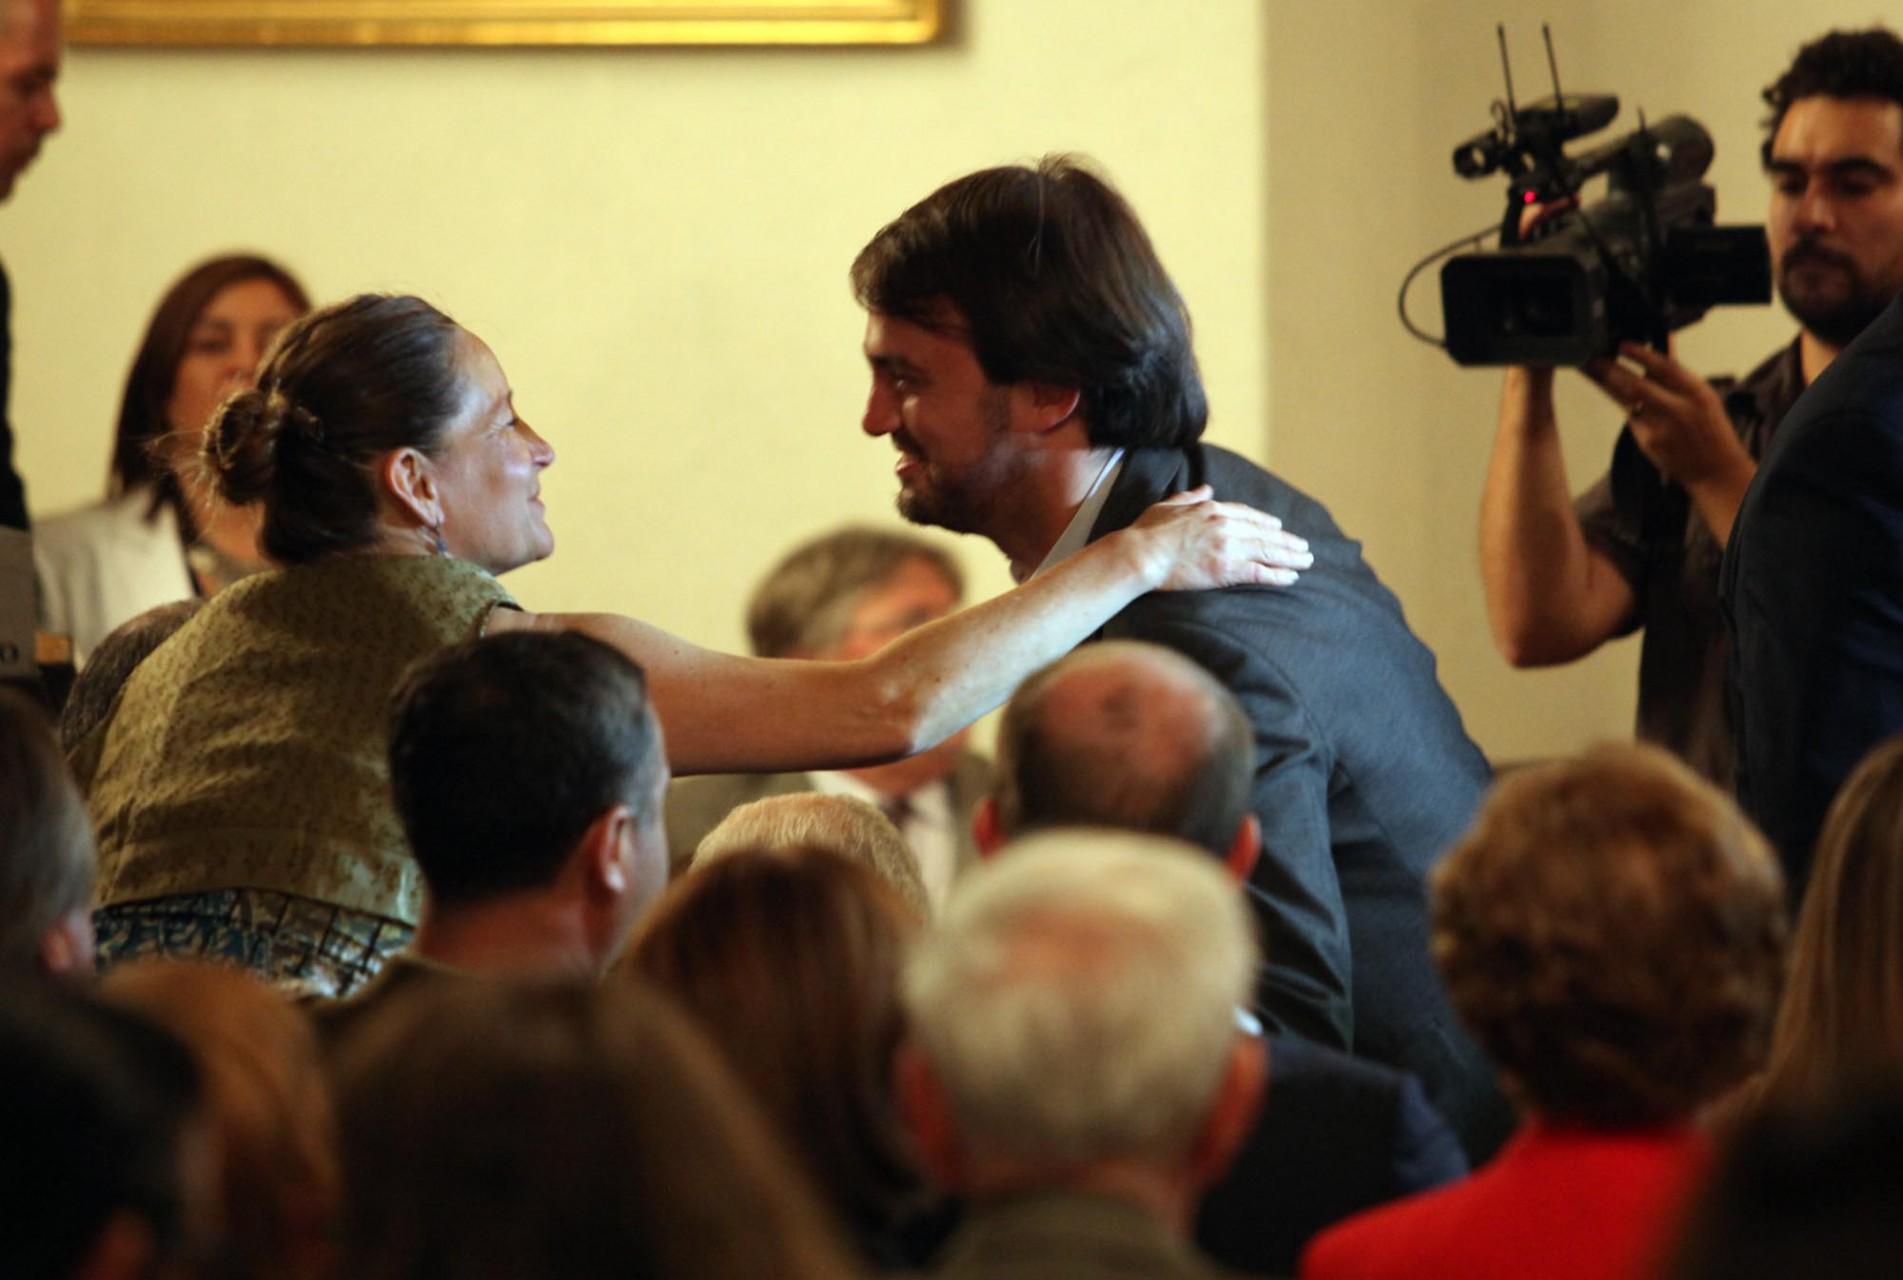 La saliente concejal Paula Quintana también está aquí: pese a ser socialista apoyó a Sharp en vez de al candidato oficialista DJ Méndez.